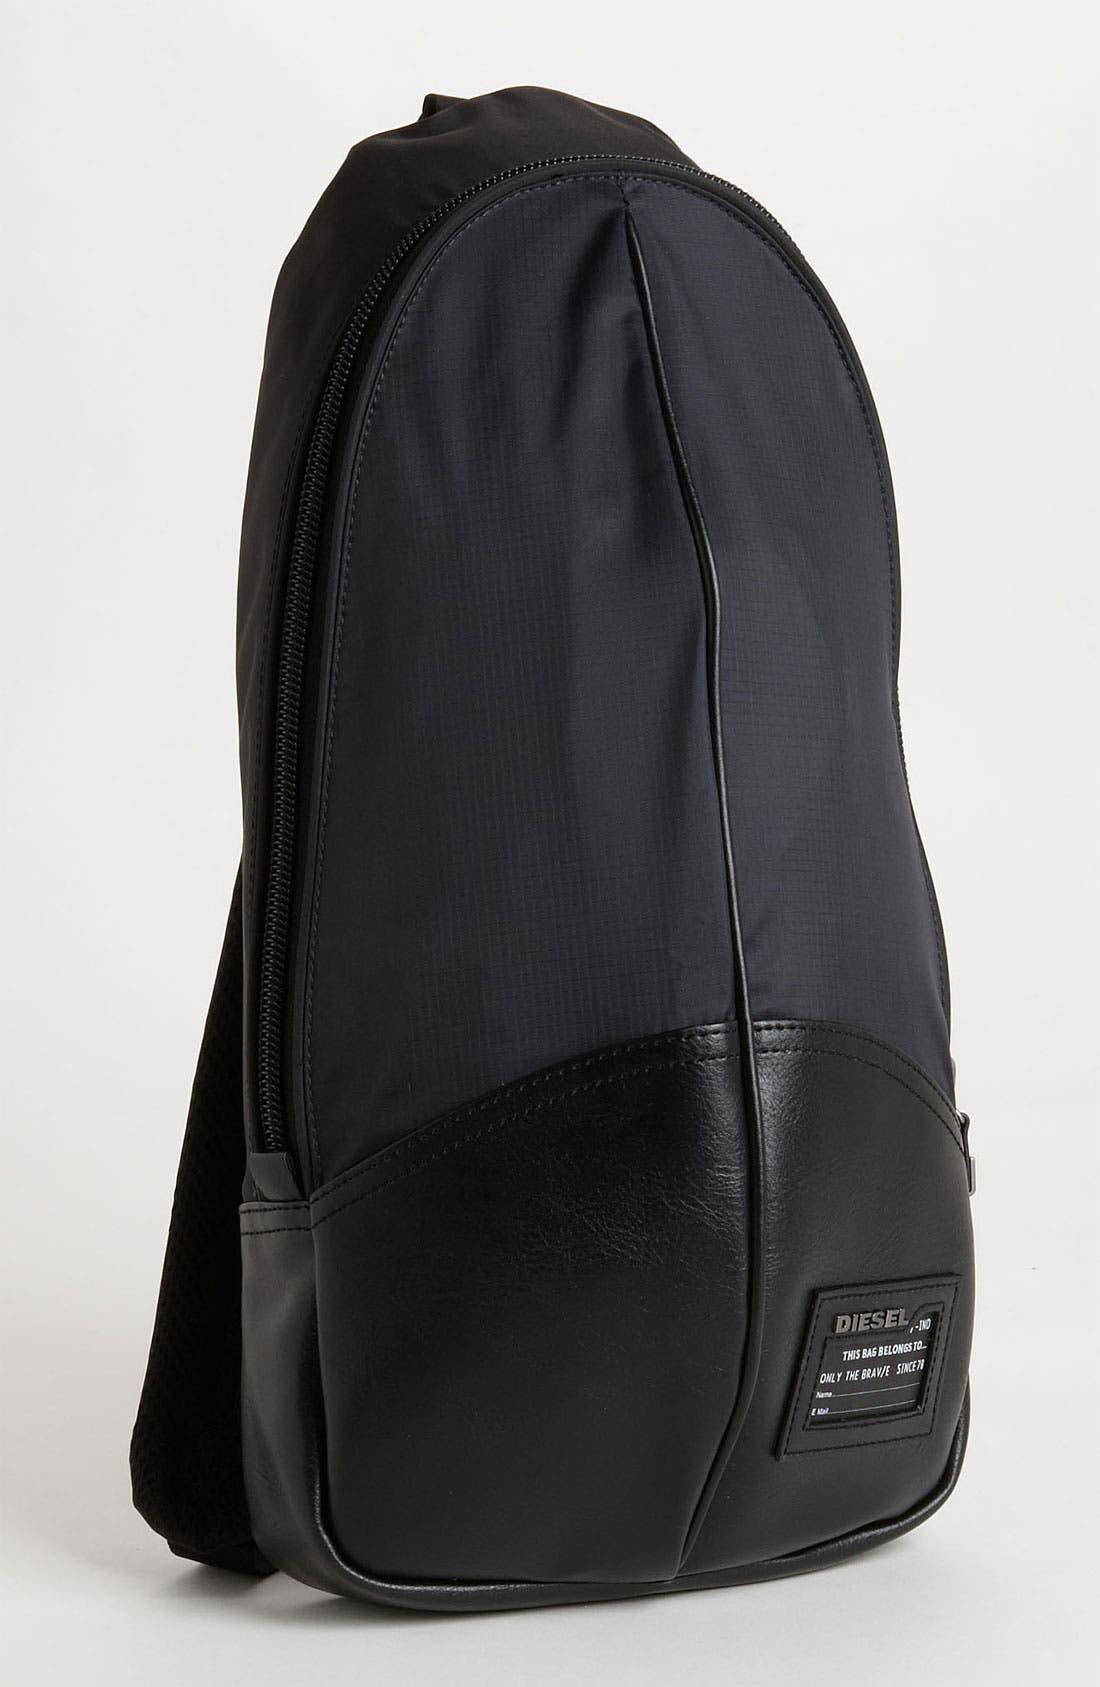 Alternate Image 1 Selected - DIESEL® 'Processor' Crossbody Bag